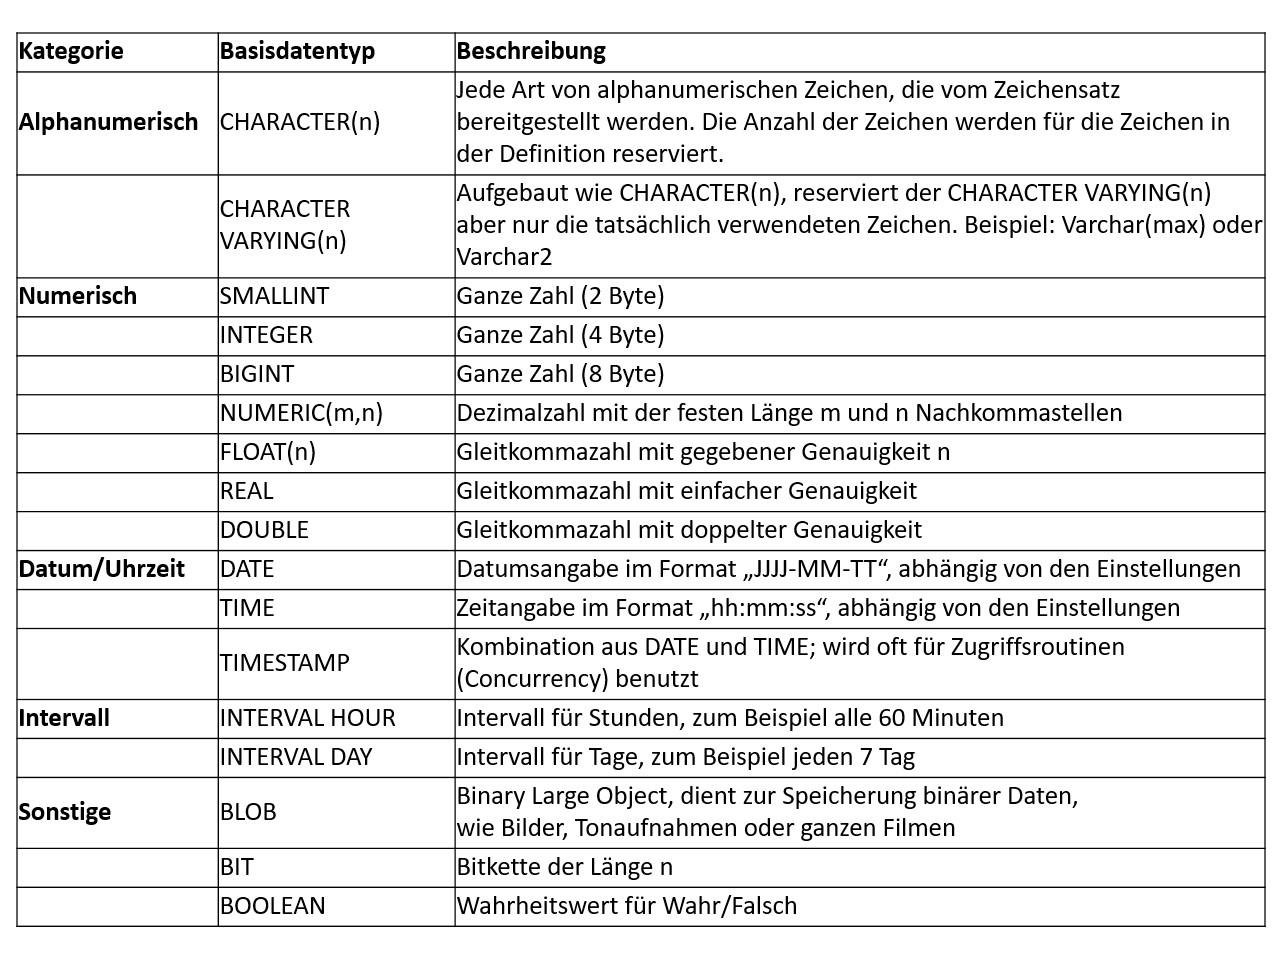 Basisdatentyp Definition & Erklärung | Datenbank Lexikon